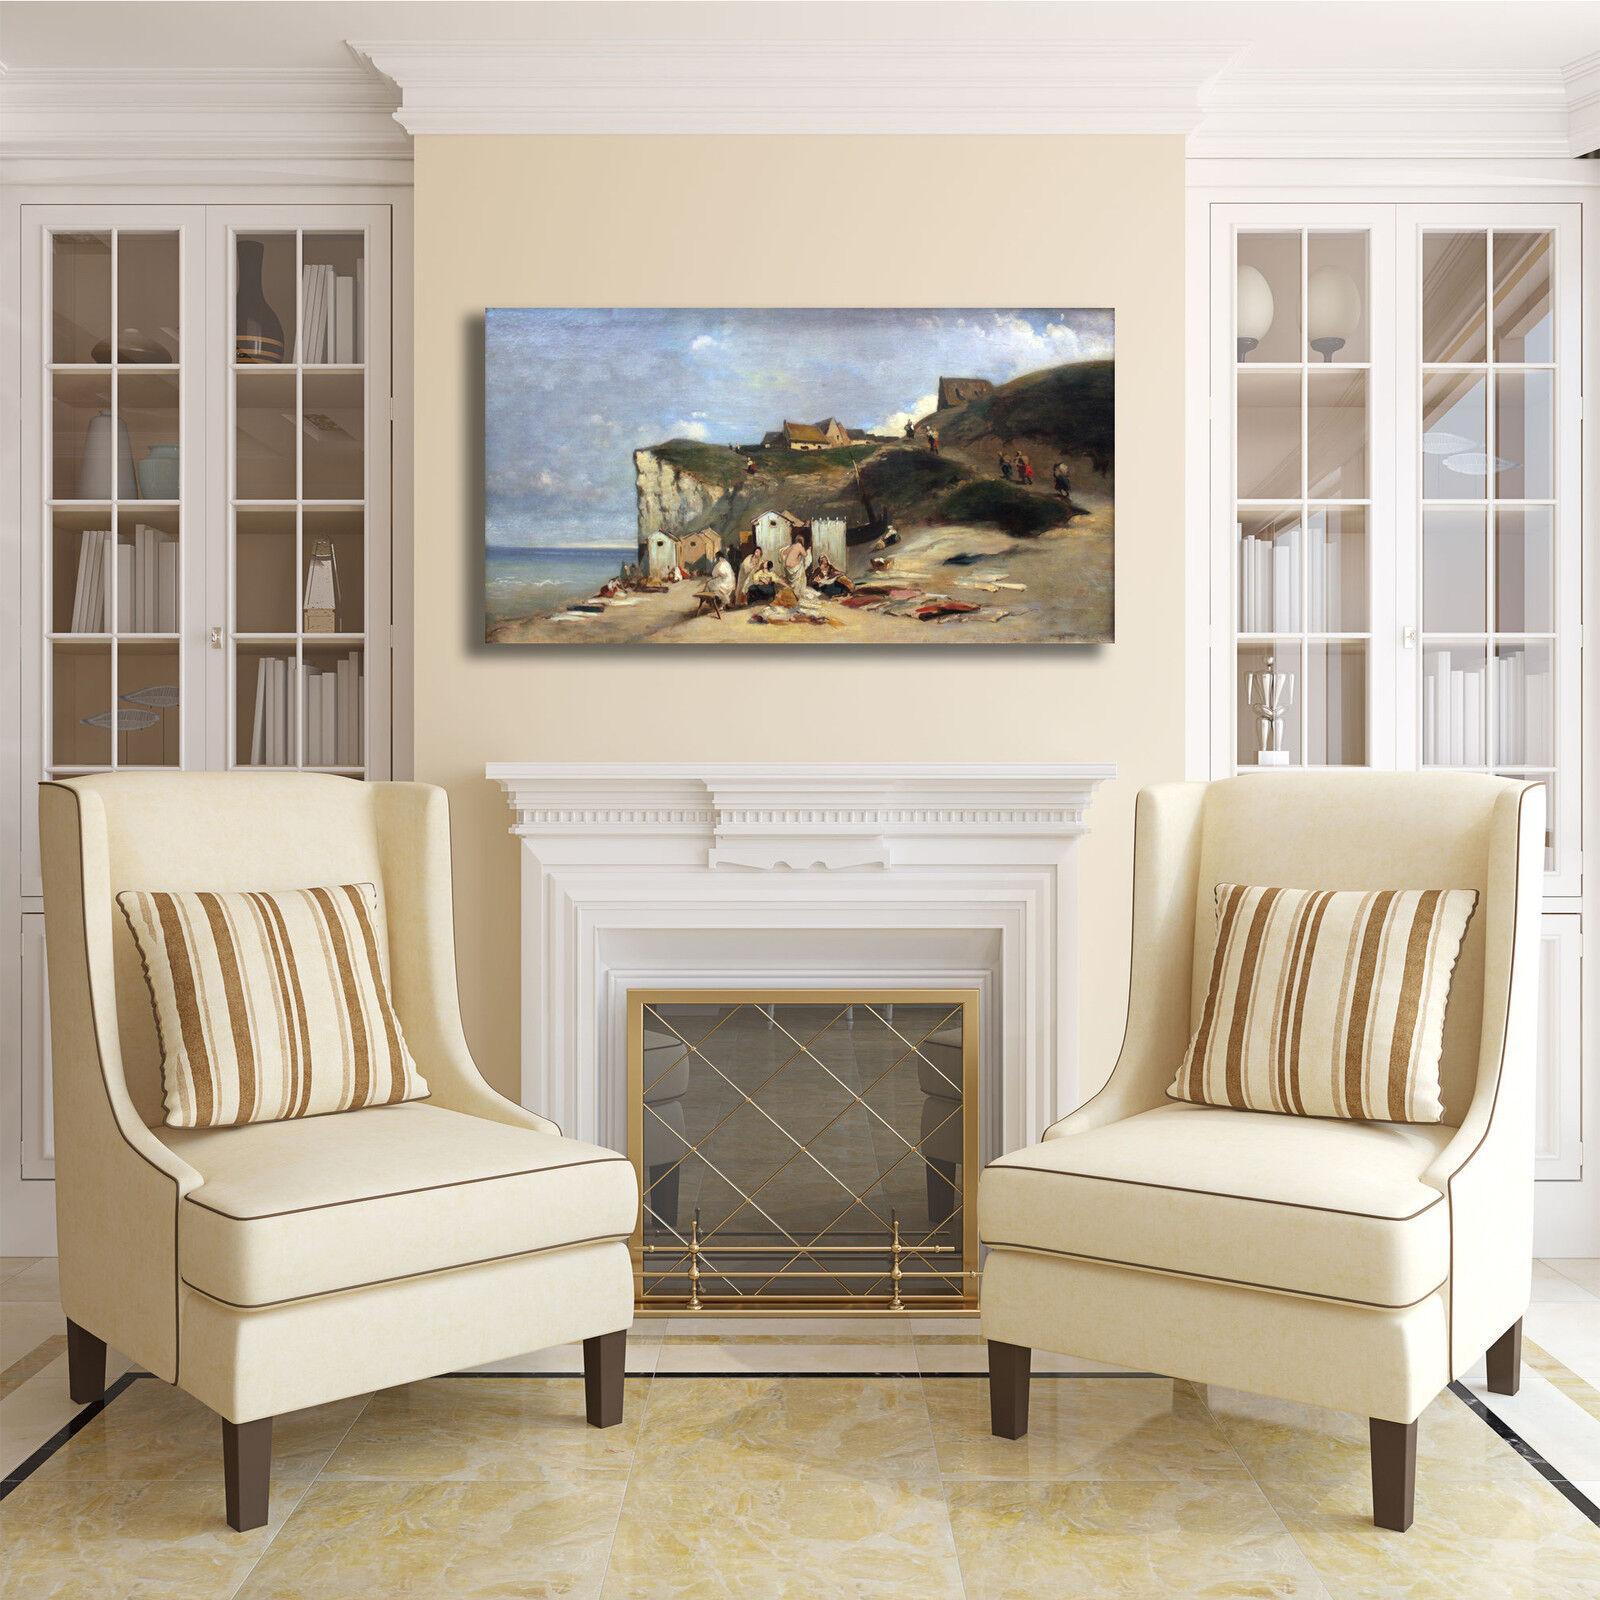 Spitzweg donne fanno bagno design quadro stampa casa tela dipinto telaio arrossoo casa stampa ec92db